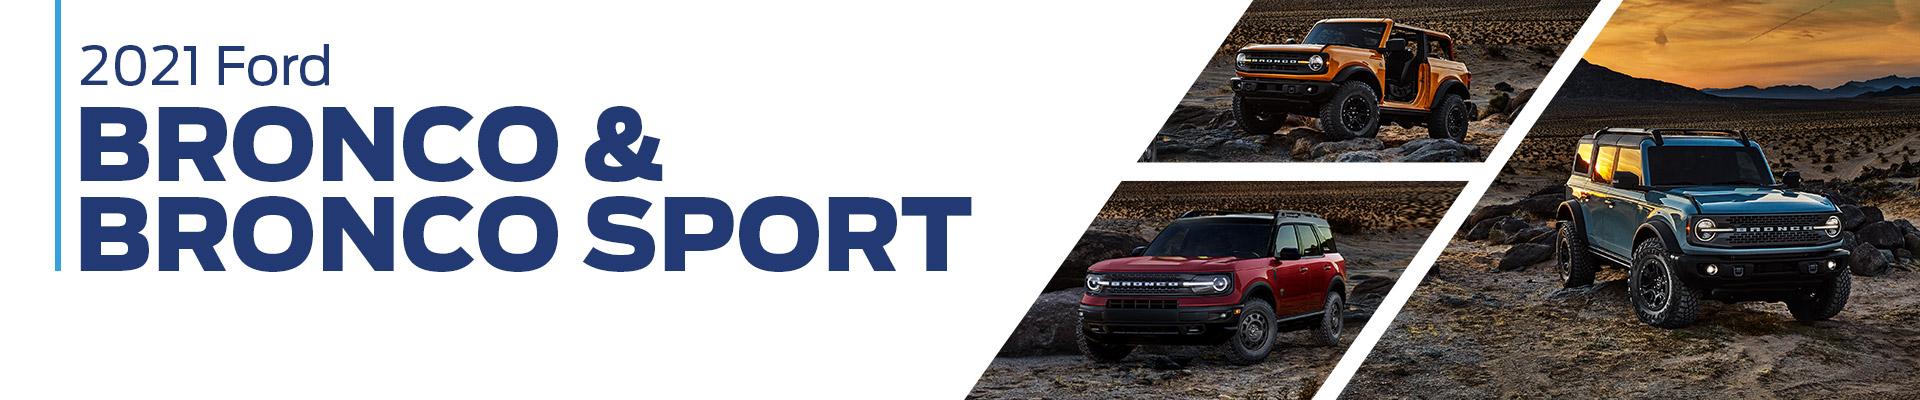 2021 Ford Bronco & Ford Bronco Sport - Sun State Ford - Orlando, FL